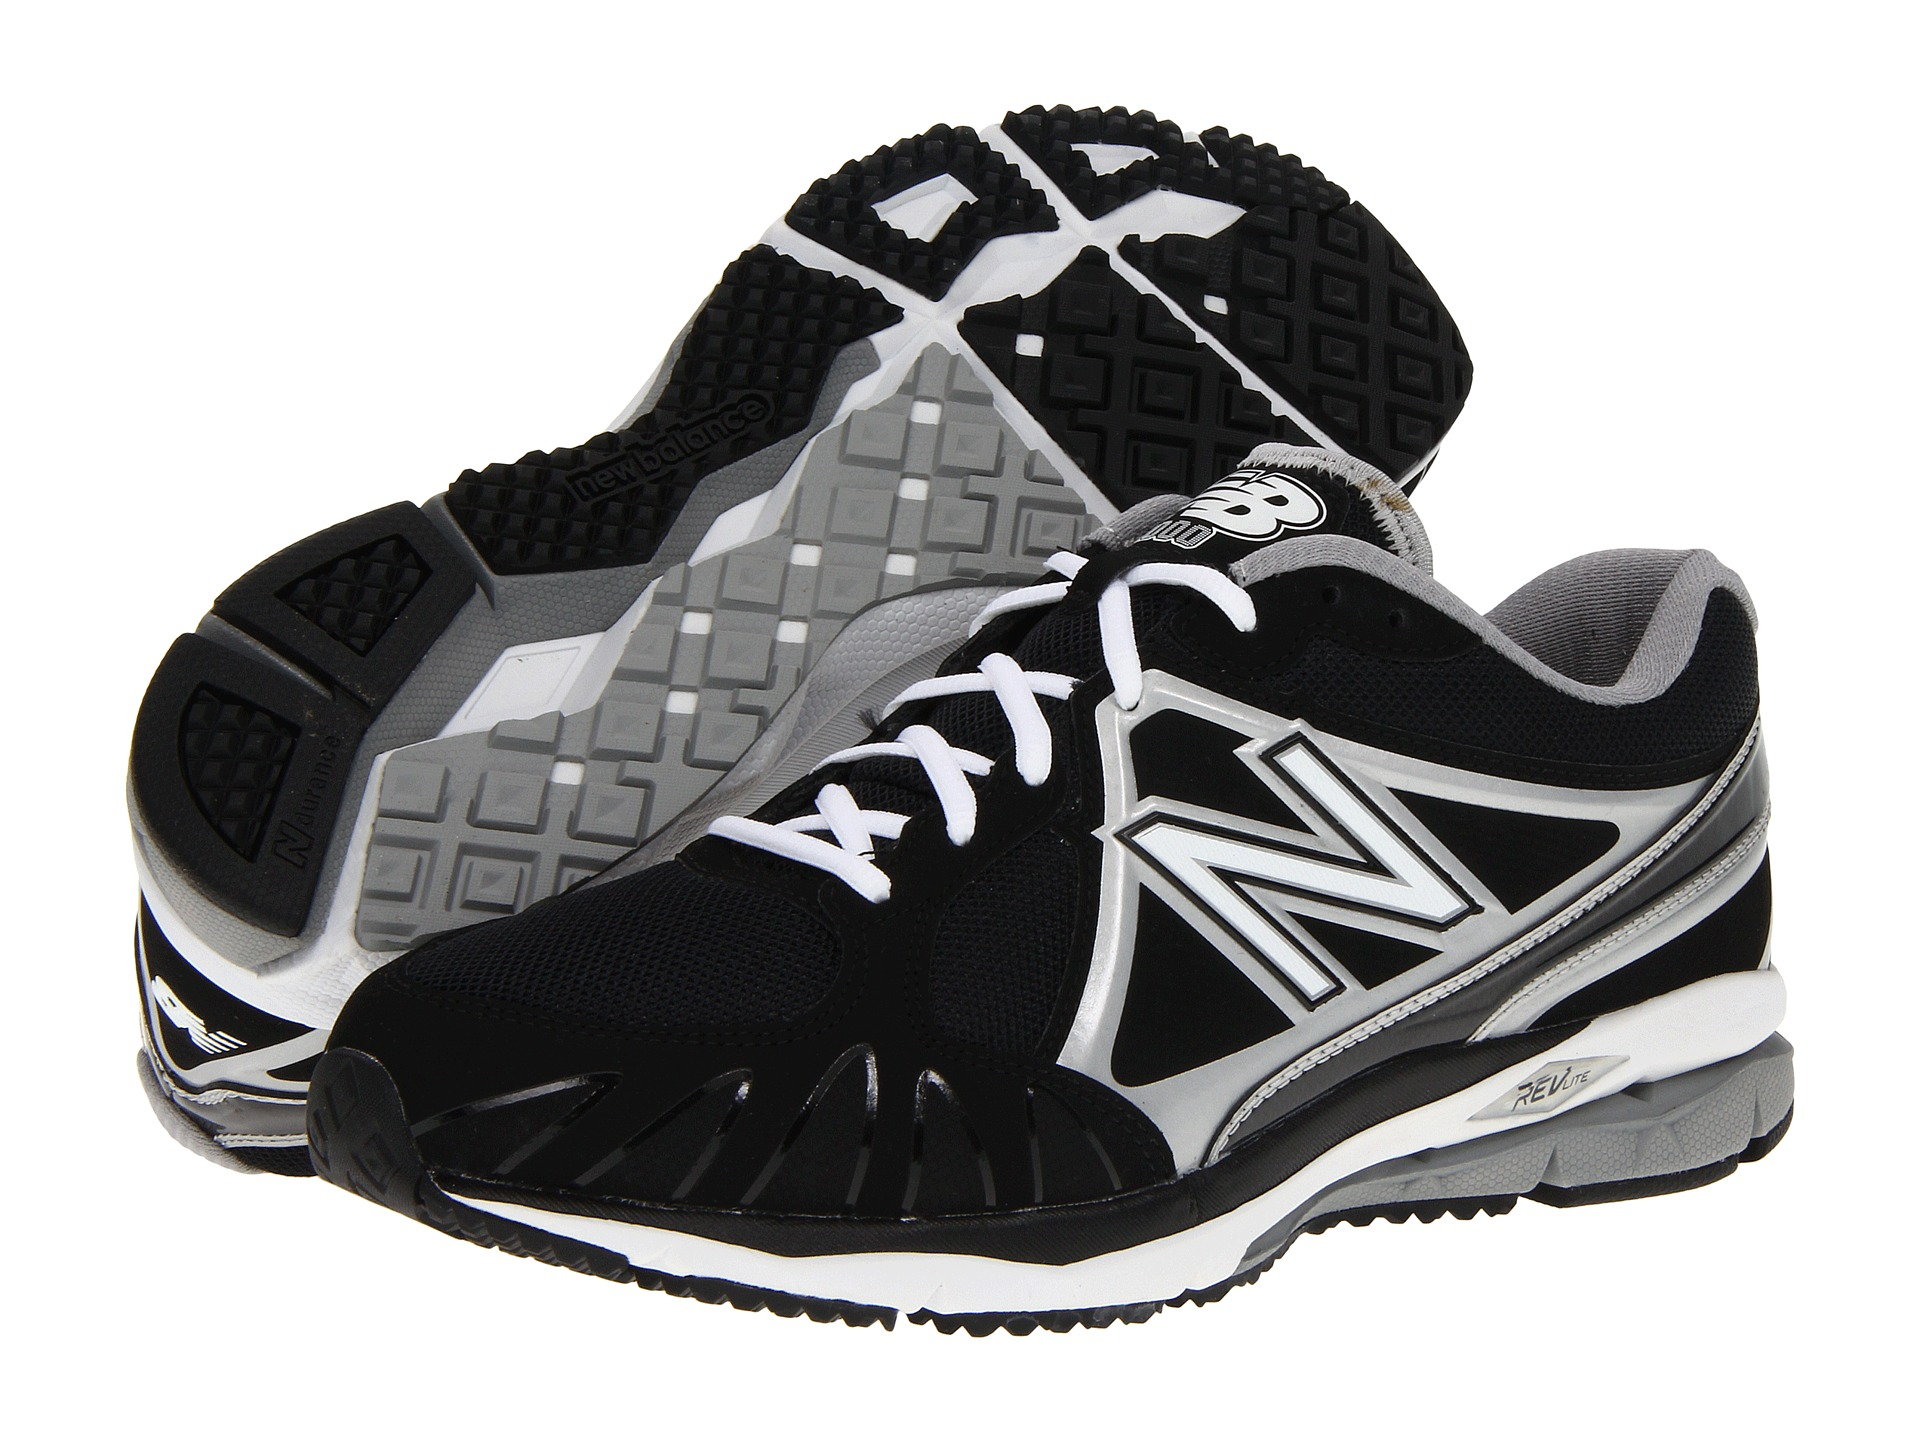 New Balance Wide Turf Shoes